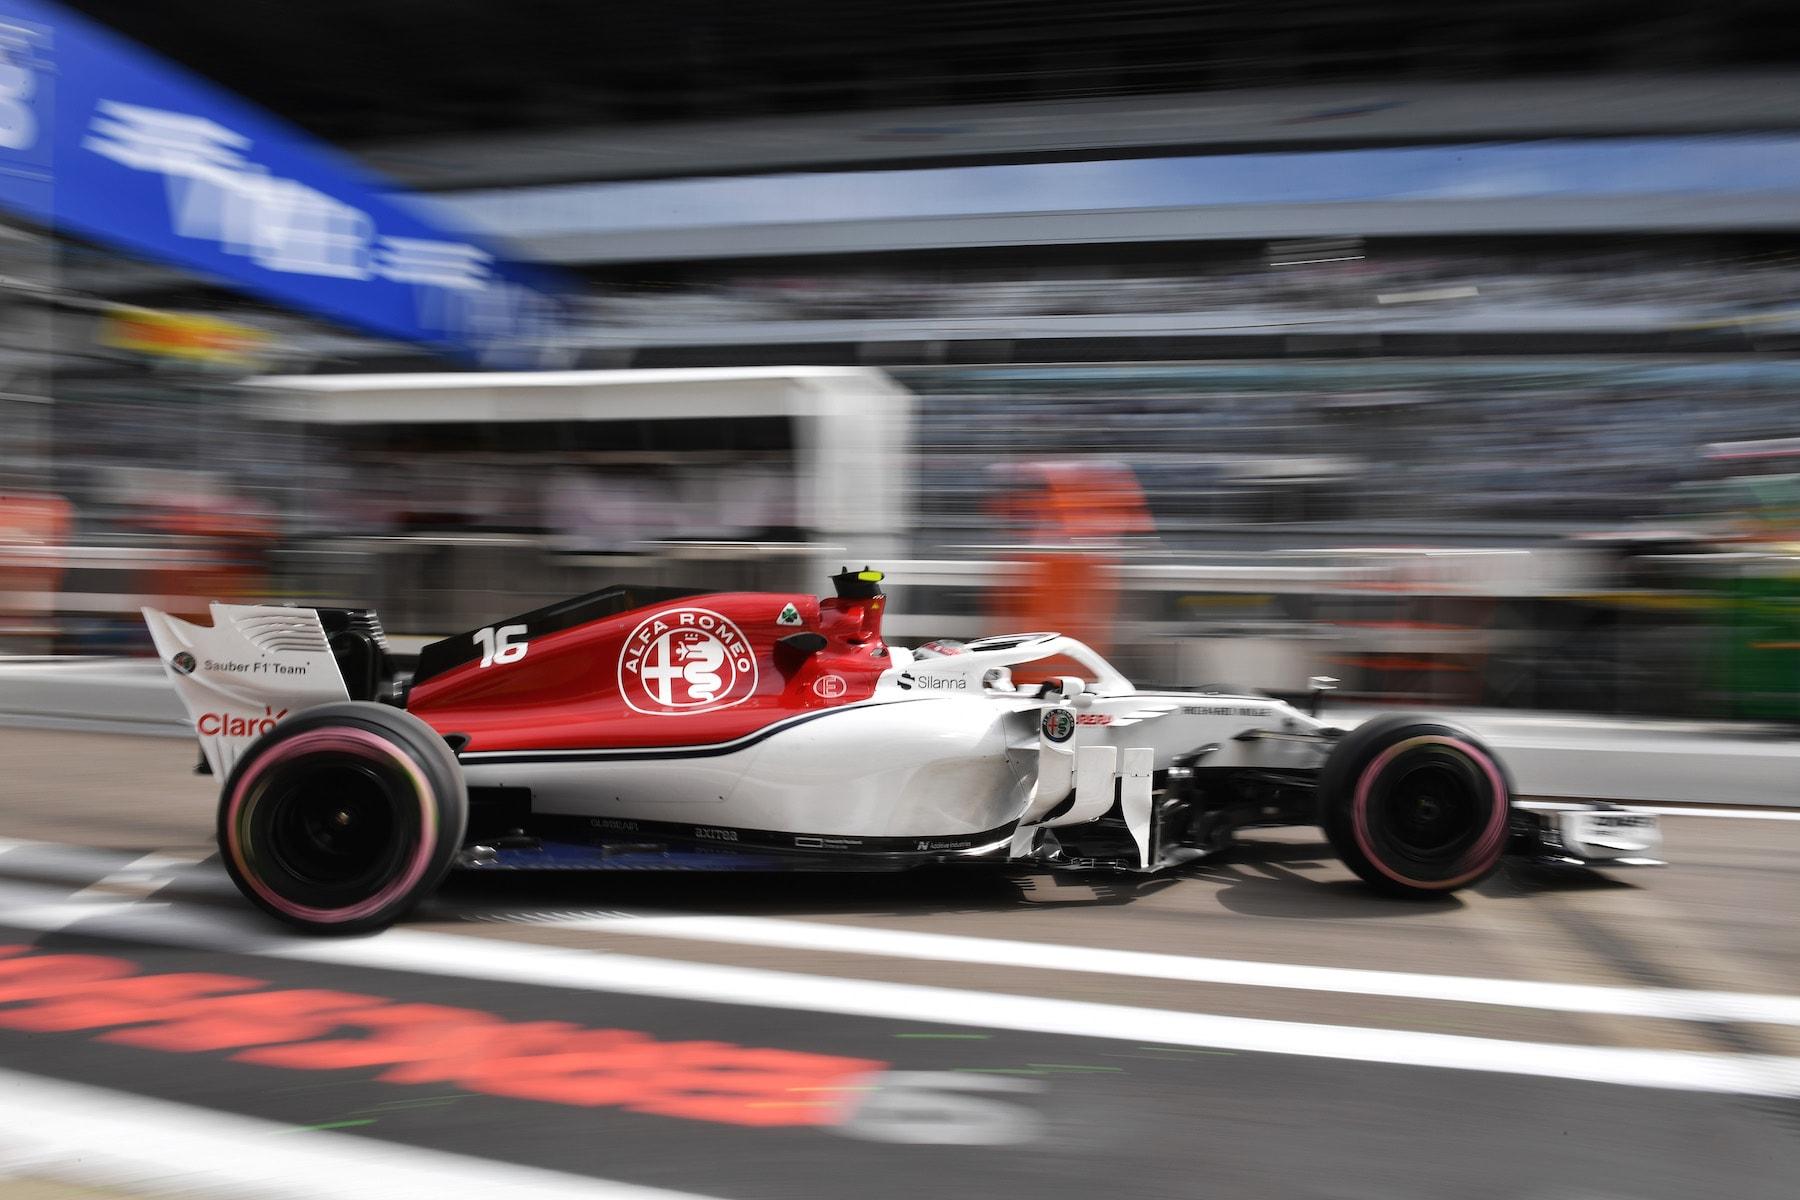 2018 Charles Leclerc | Sauber C37 | 2018 Russian GP FP1 1 copy.jpg